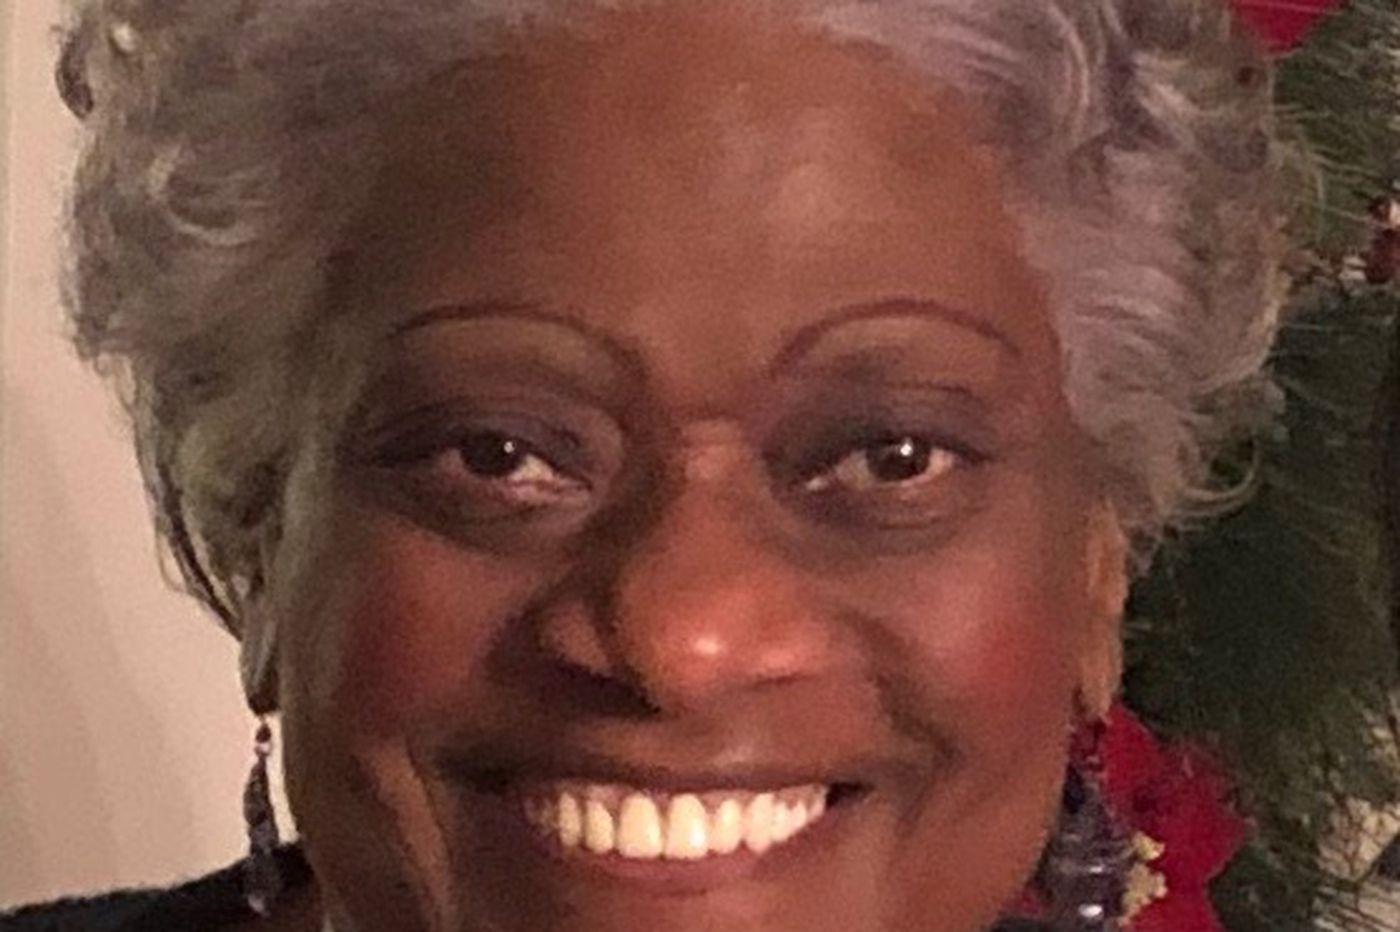 Shirley A. Dixon, 73, a groundbreaking educator at Cabrini University